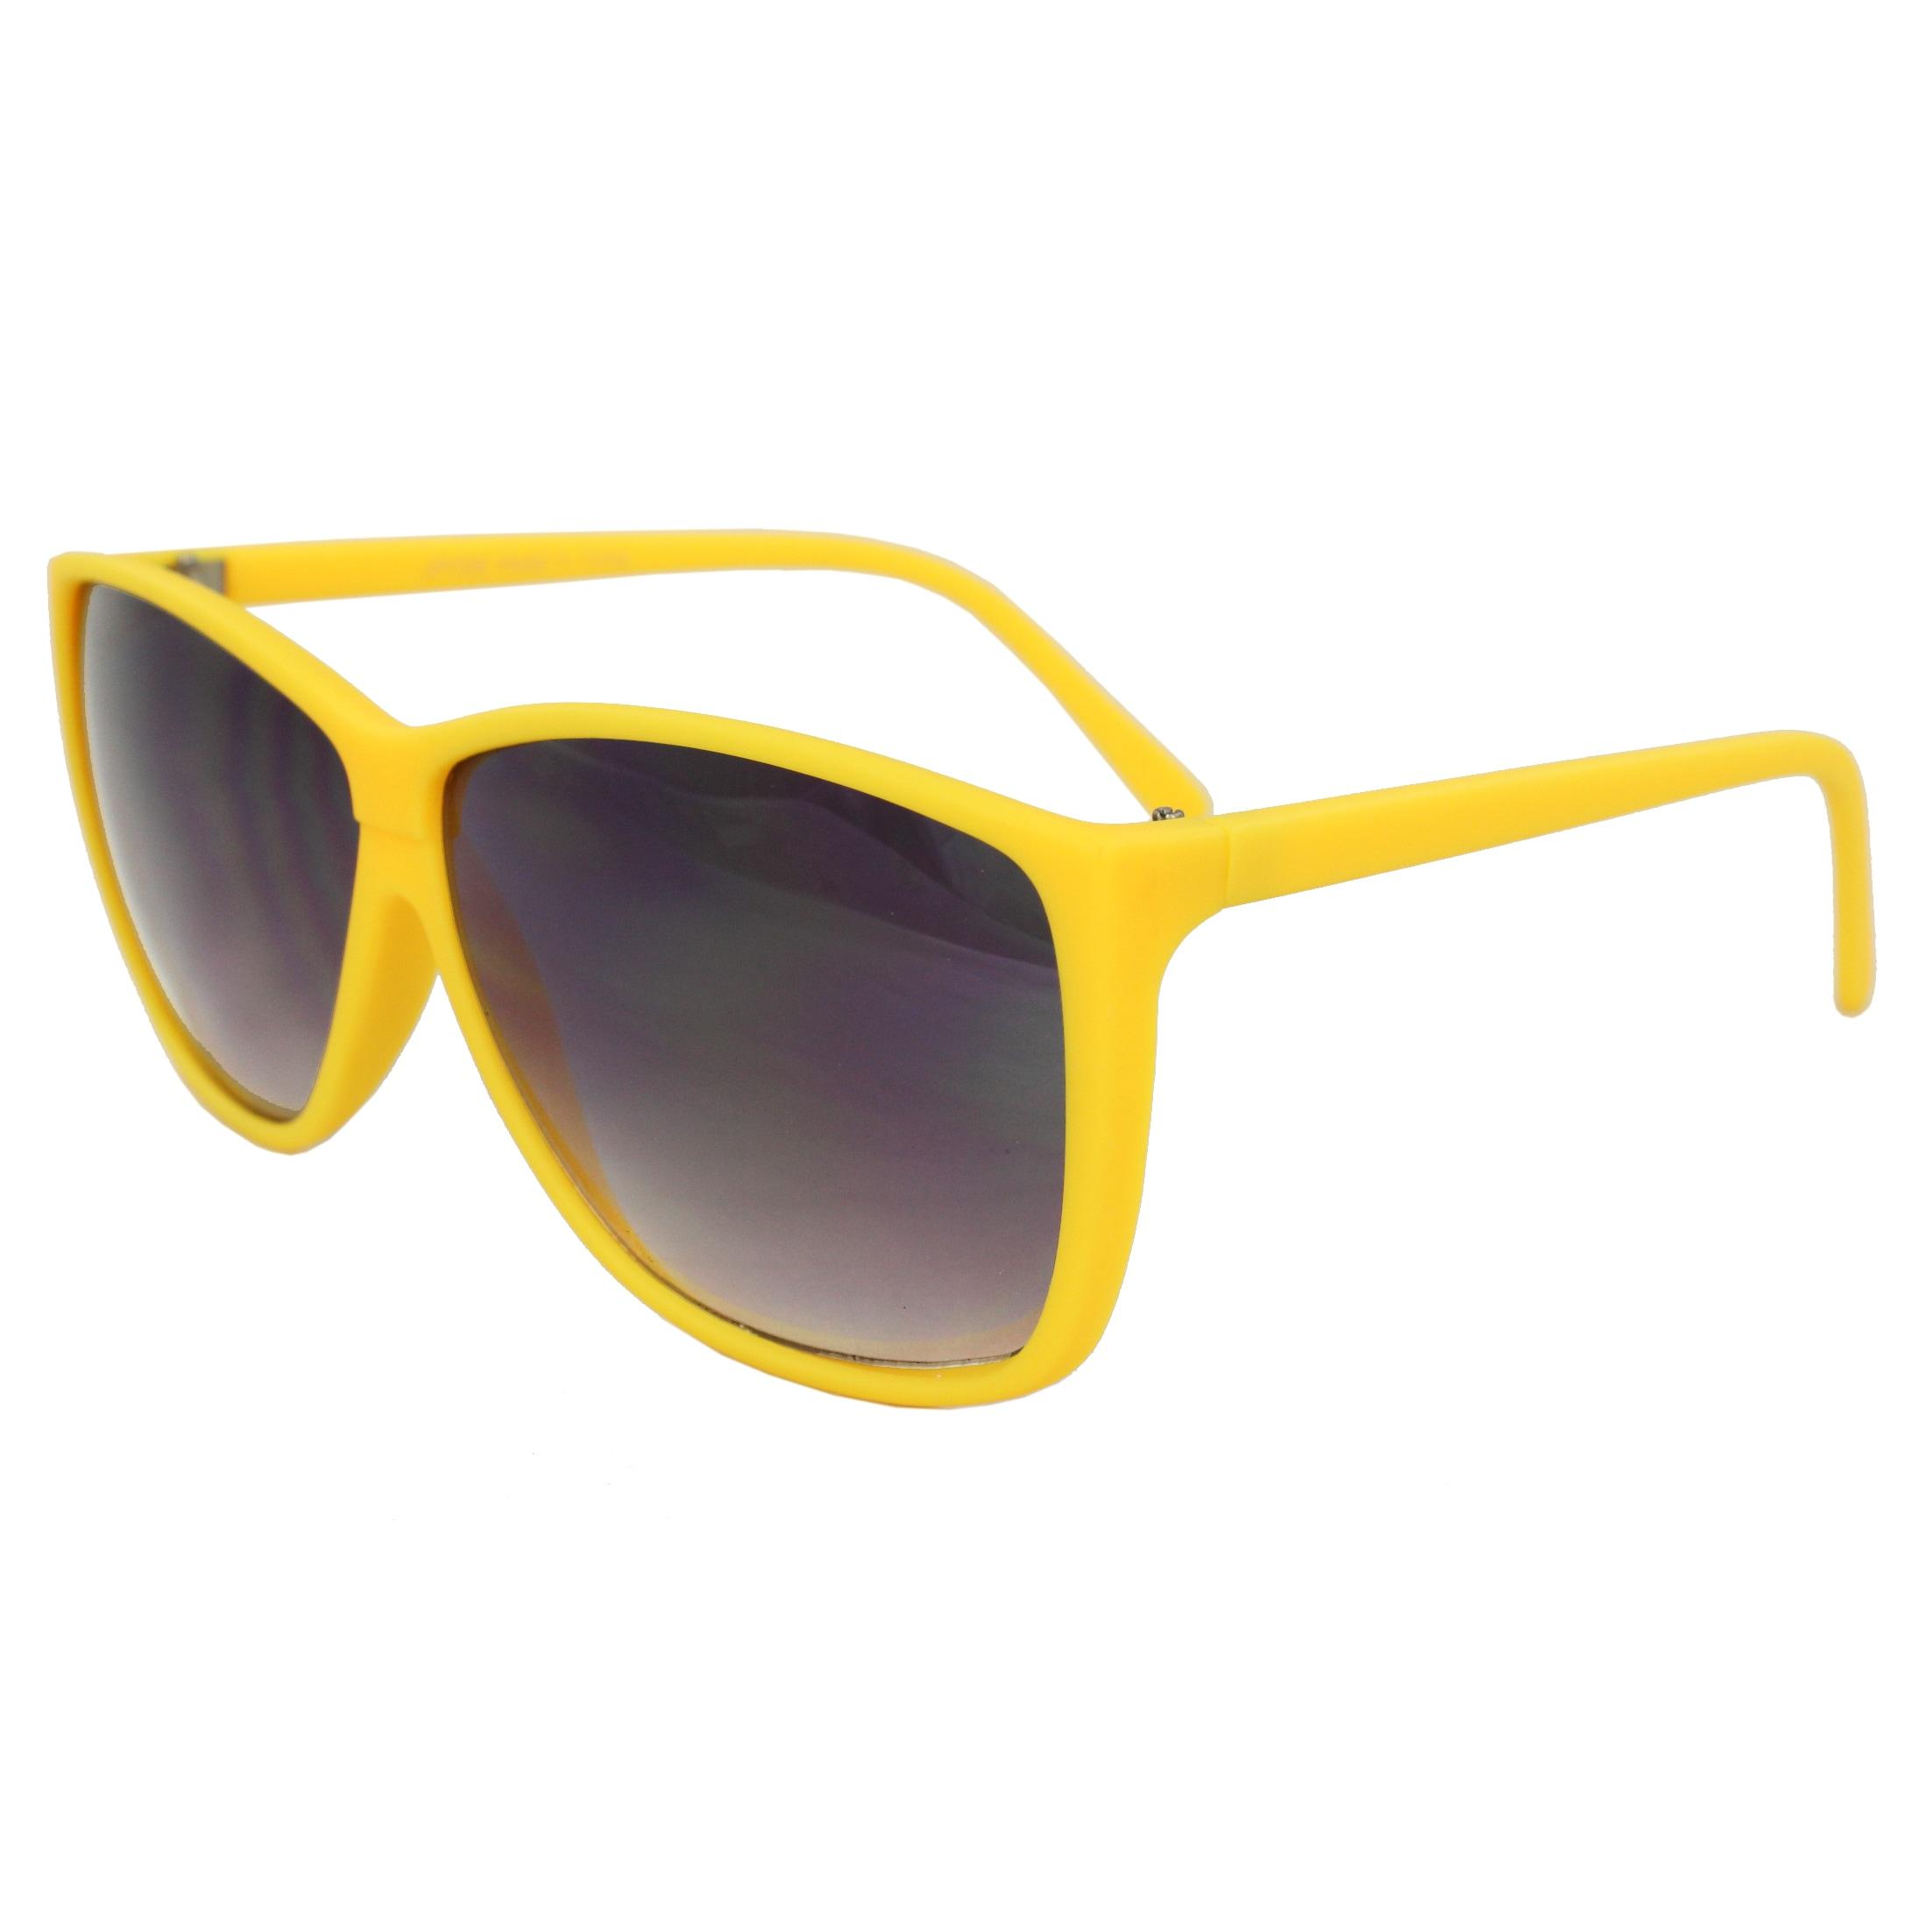 Women's Yellow Square Fashion Sunglasses